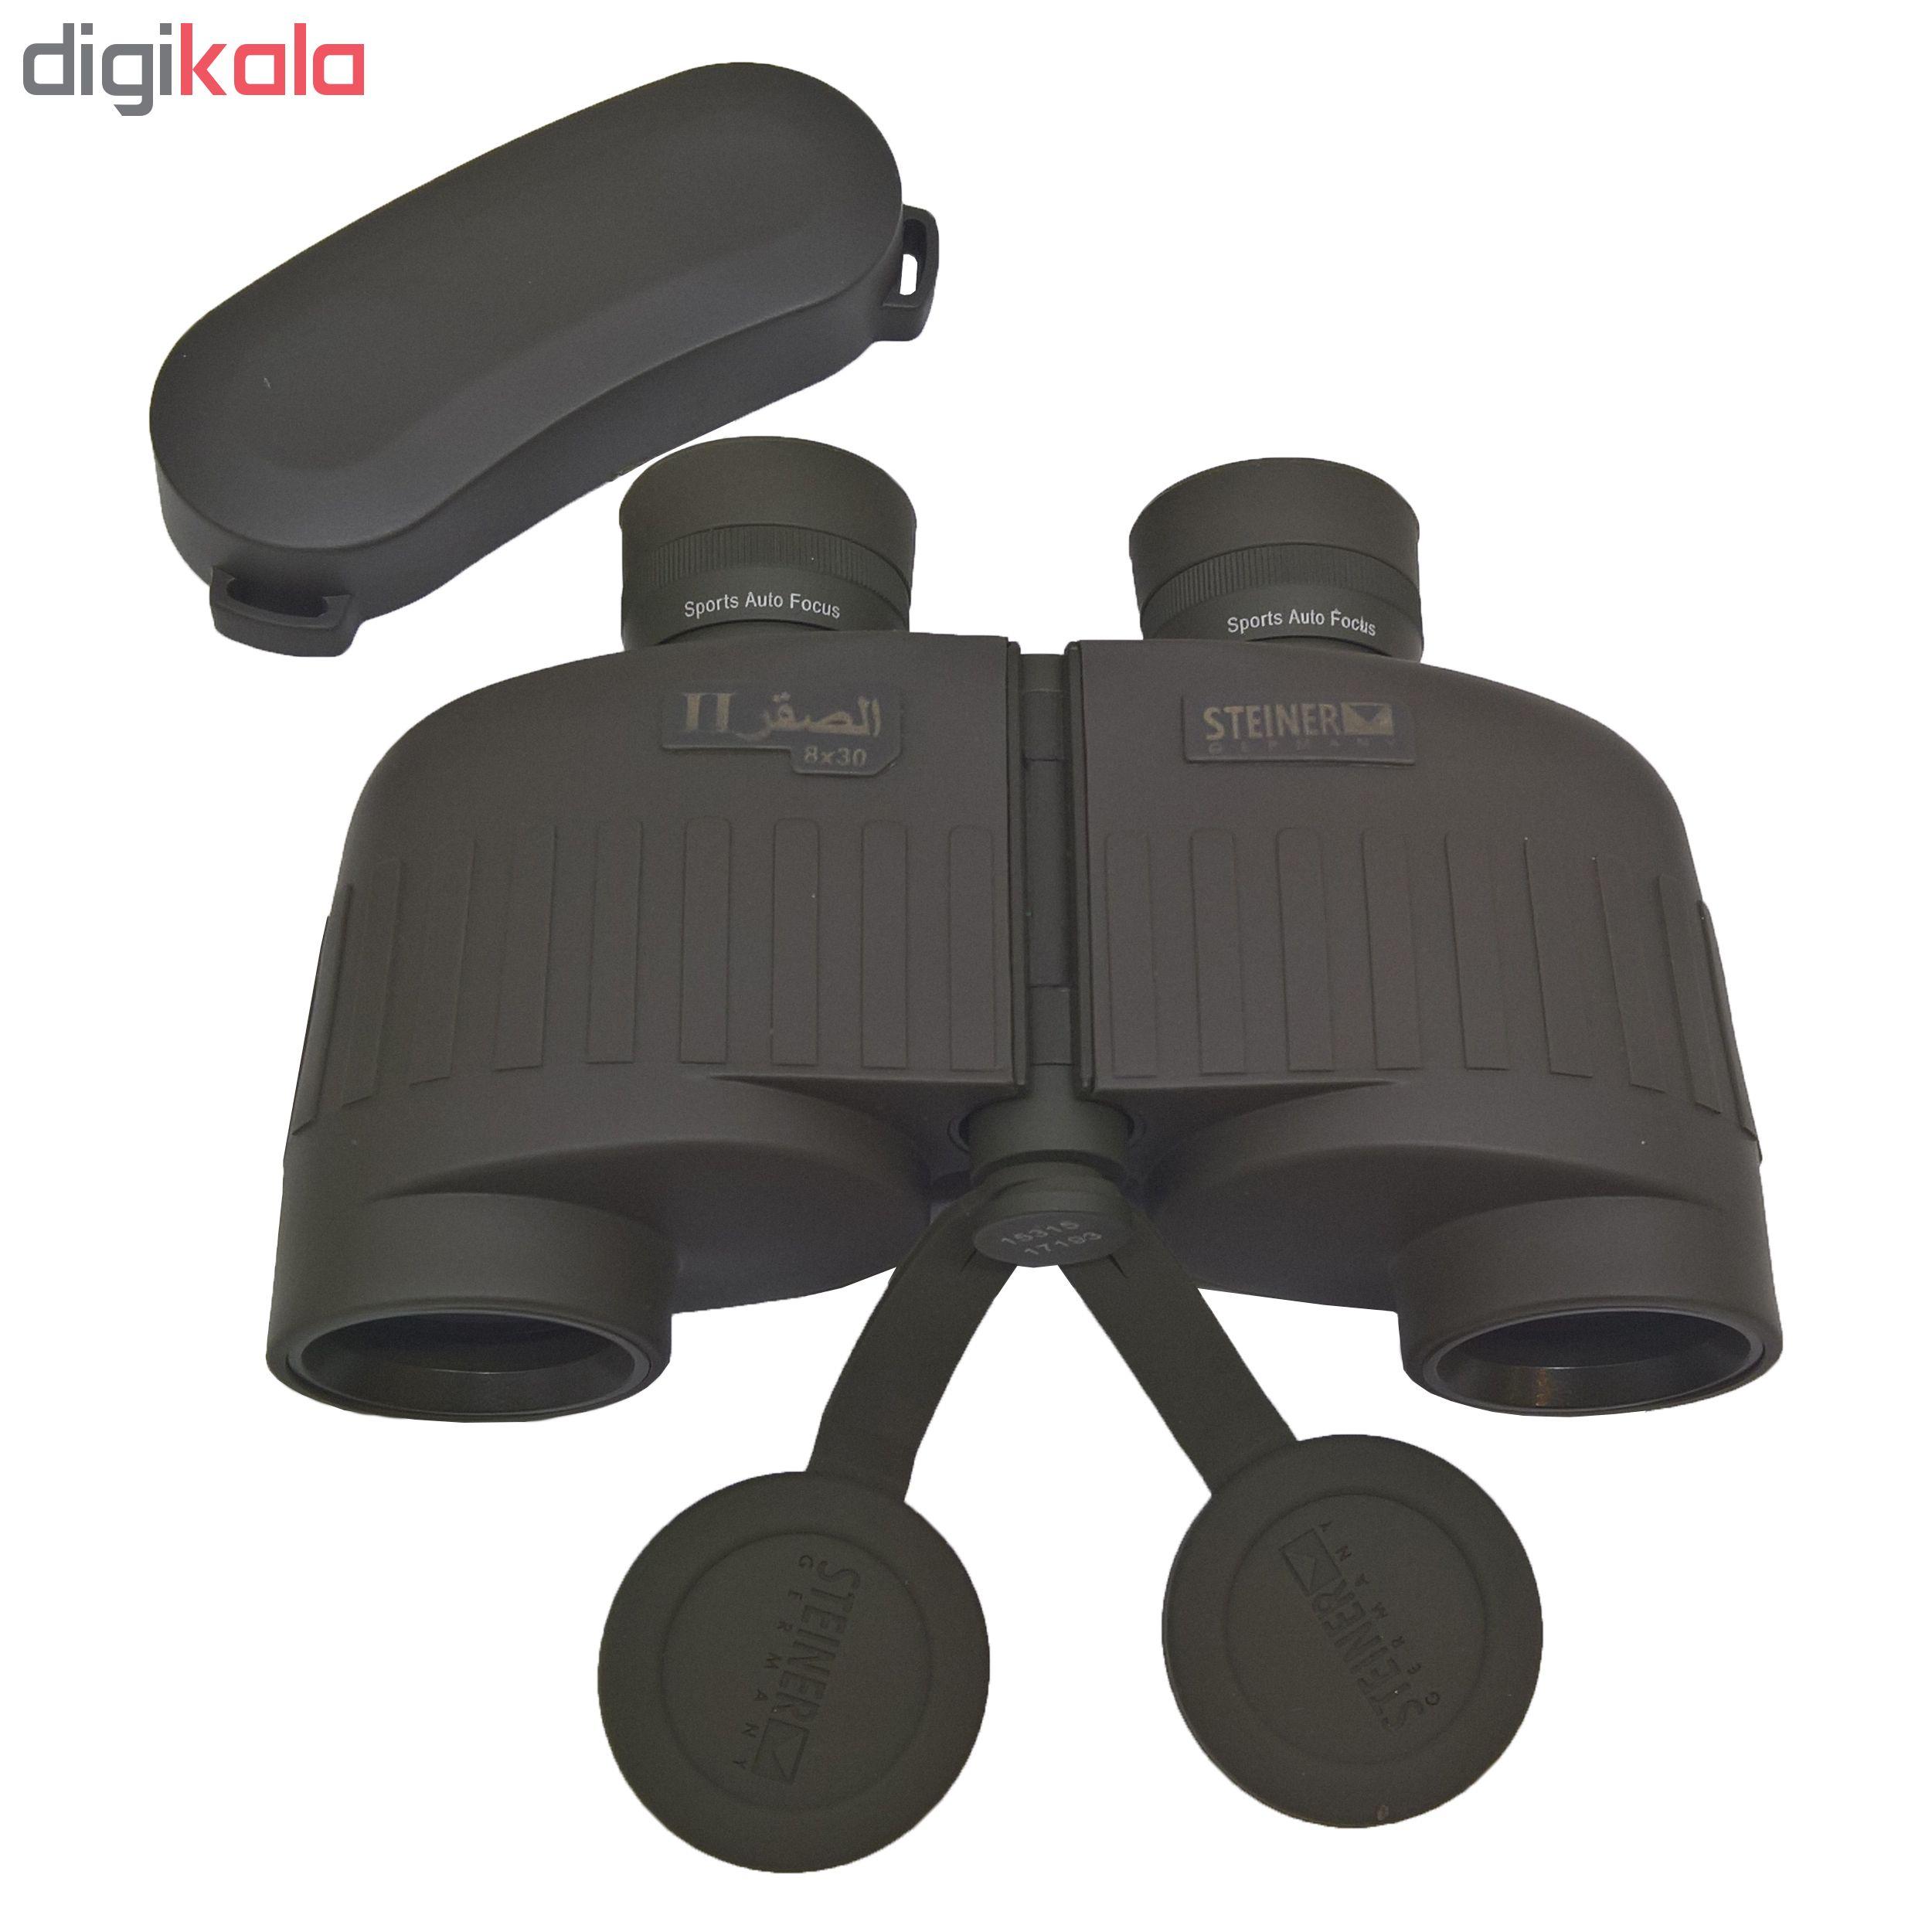 دوربین دو چشمی مدل الصقر 30×8